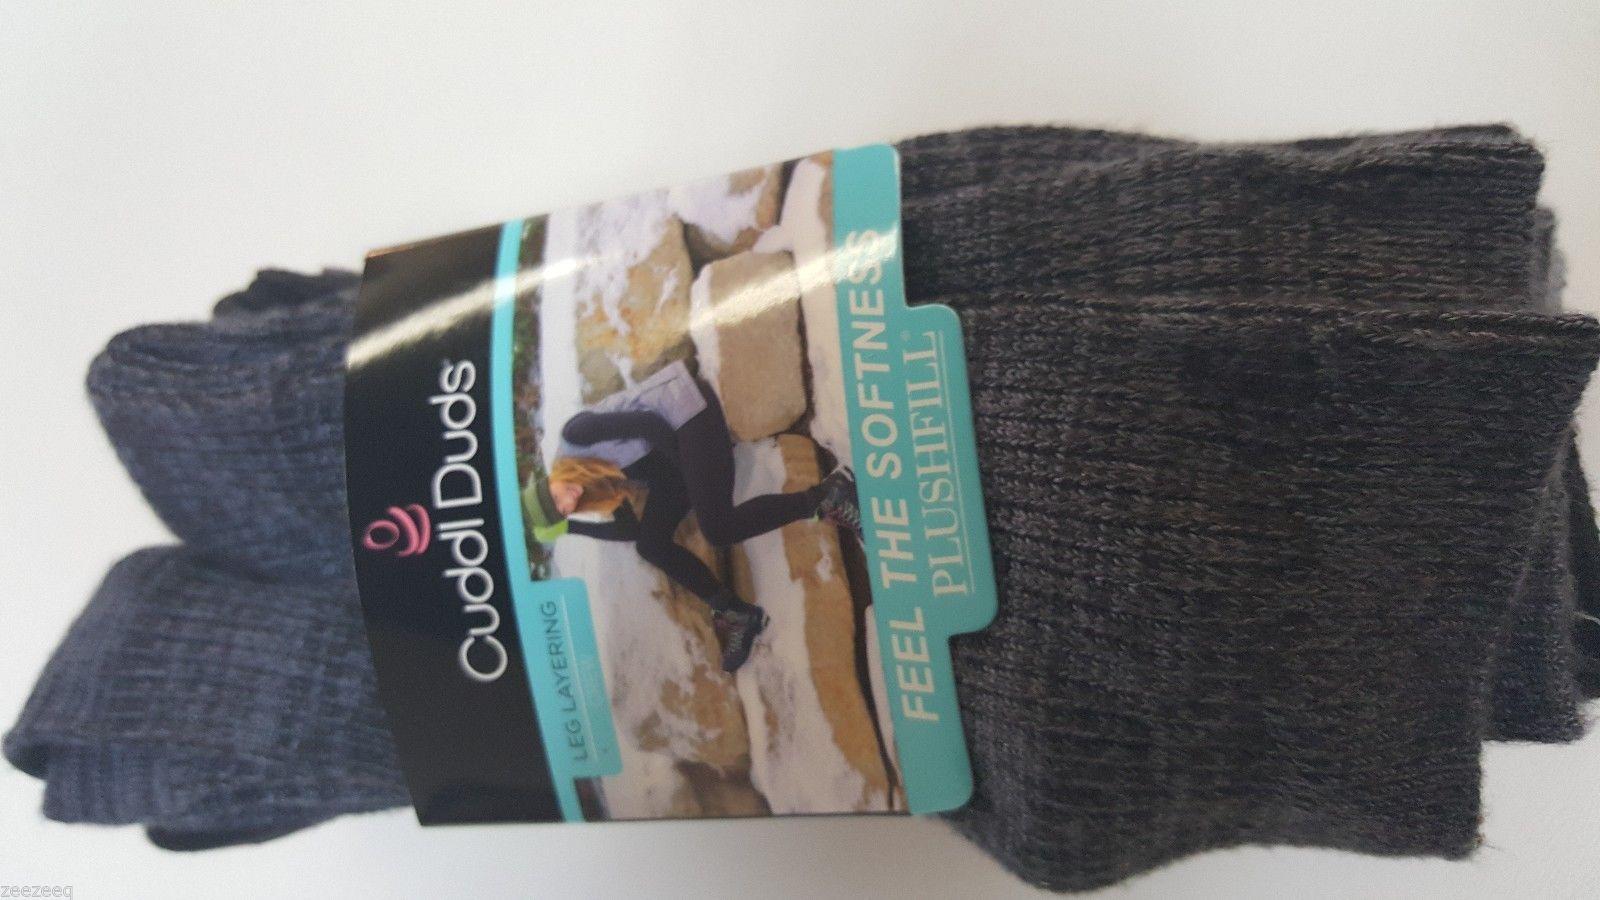 CUDDL DUDS Women/'s Leg Layering 6 Pair Crew Socks Size 4-10 BLACKS /& GRAYS